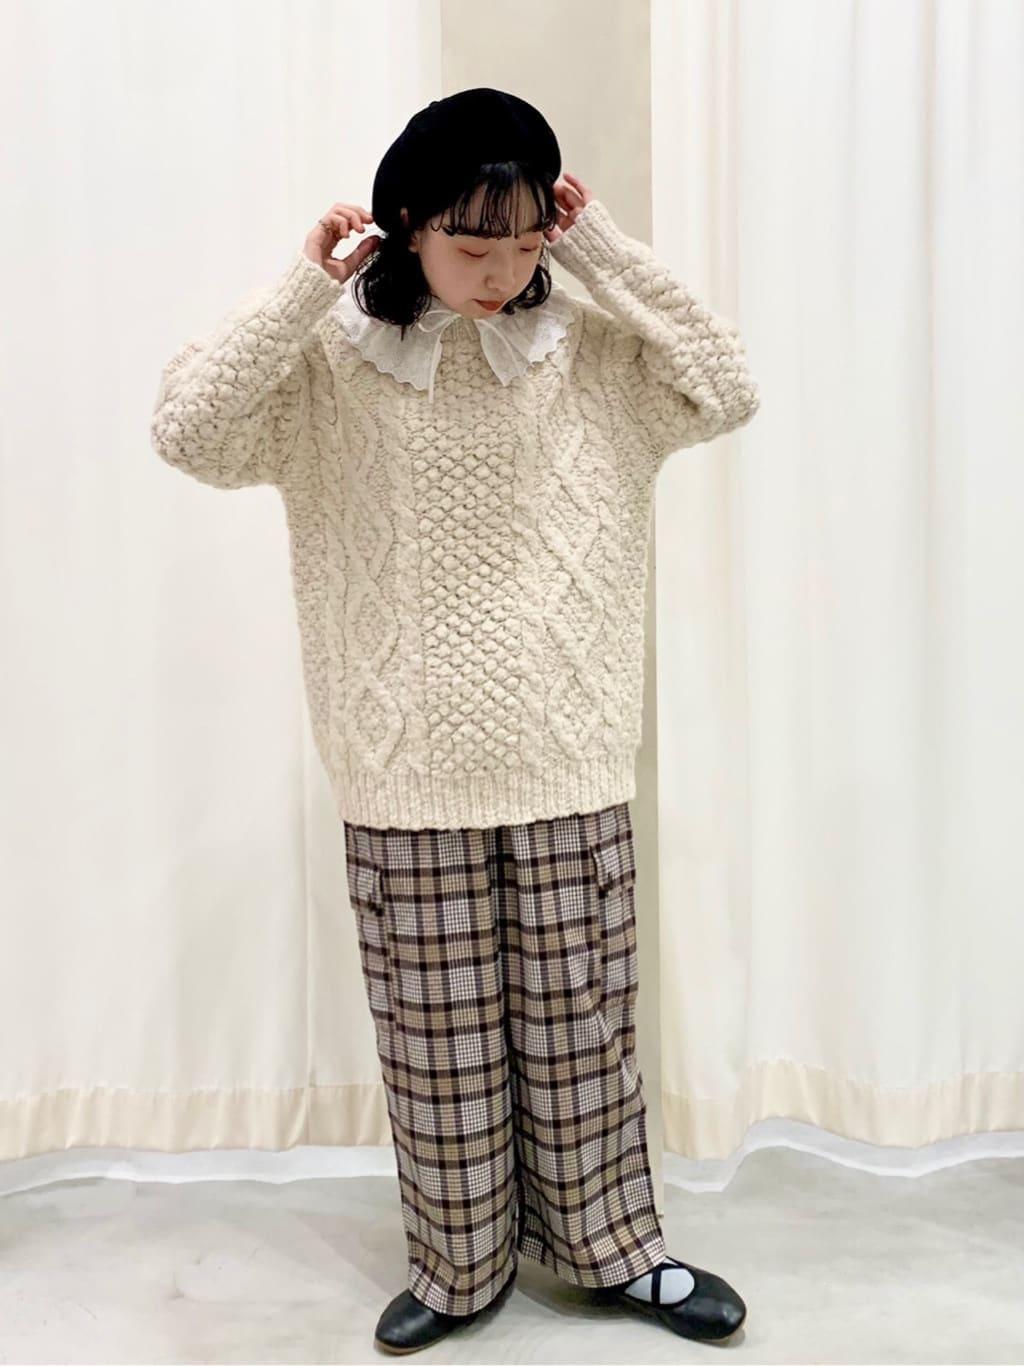 【 NEW 】- CHILD WOMAN CHILD WOMAN , PAR ICI ルミネ横浜 身長:157cm 2021.10.25